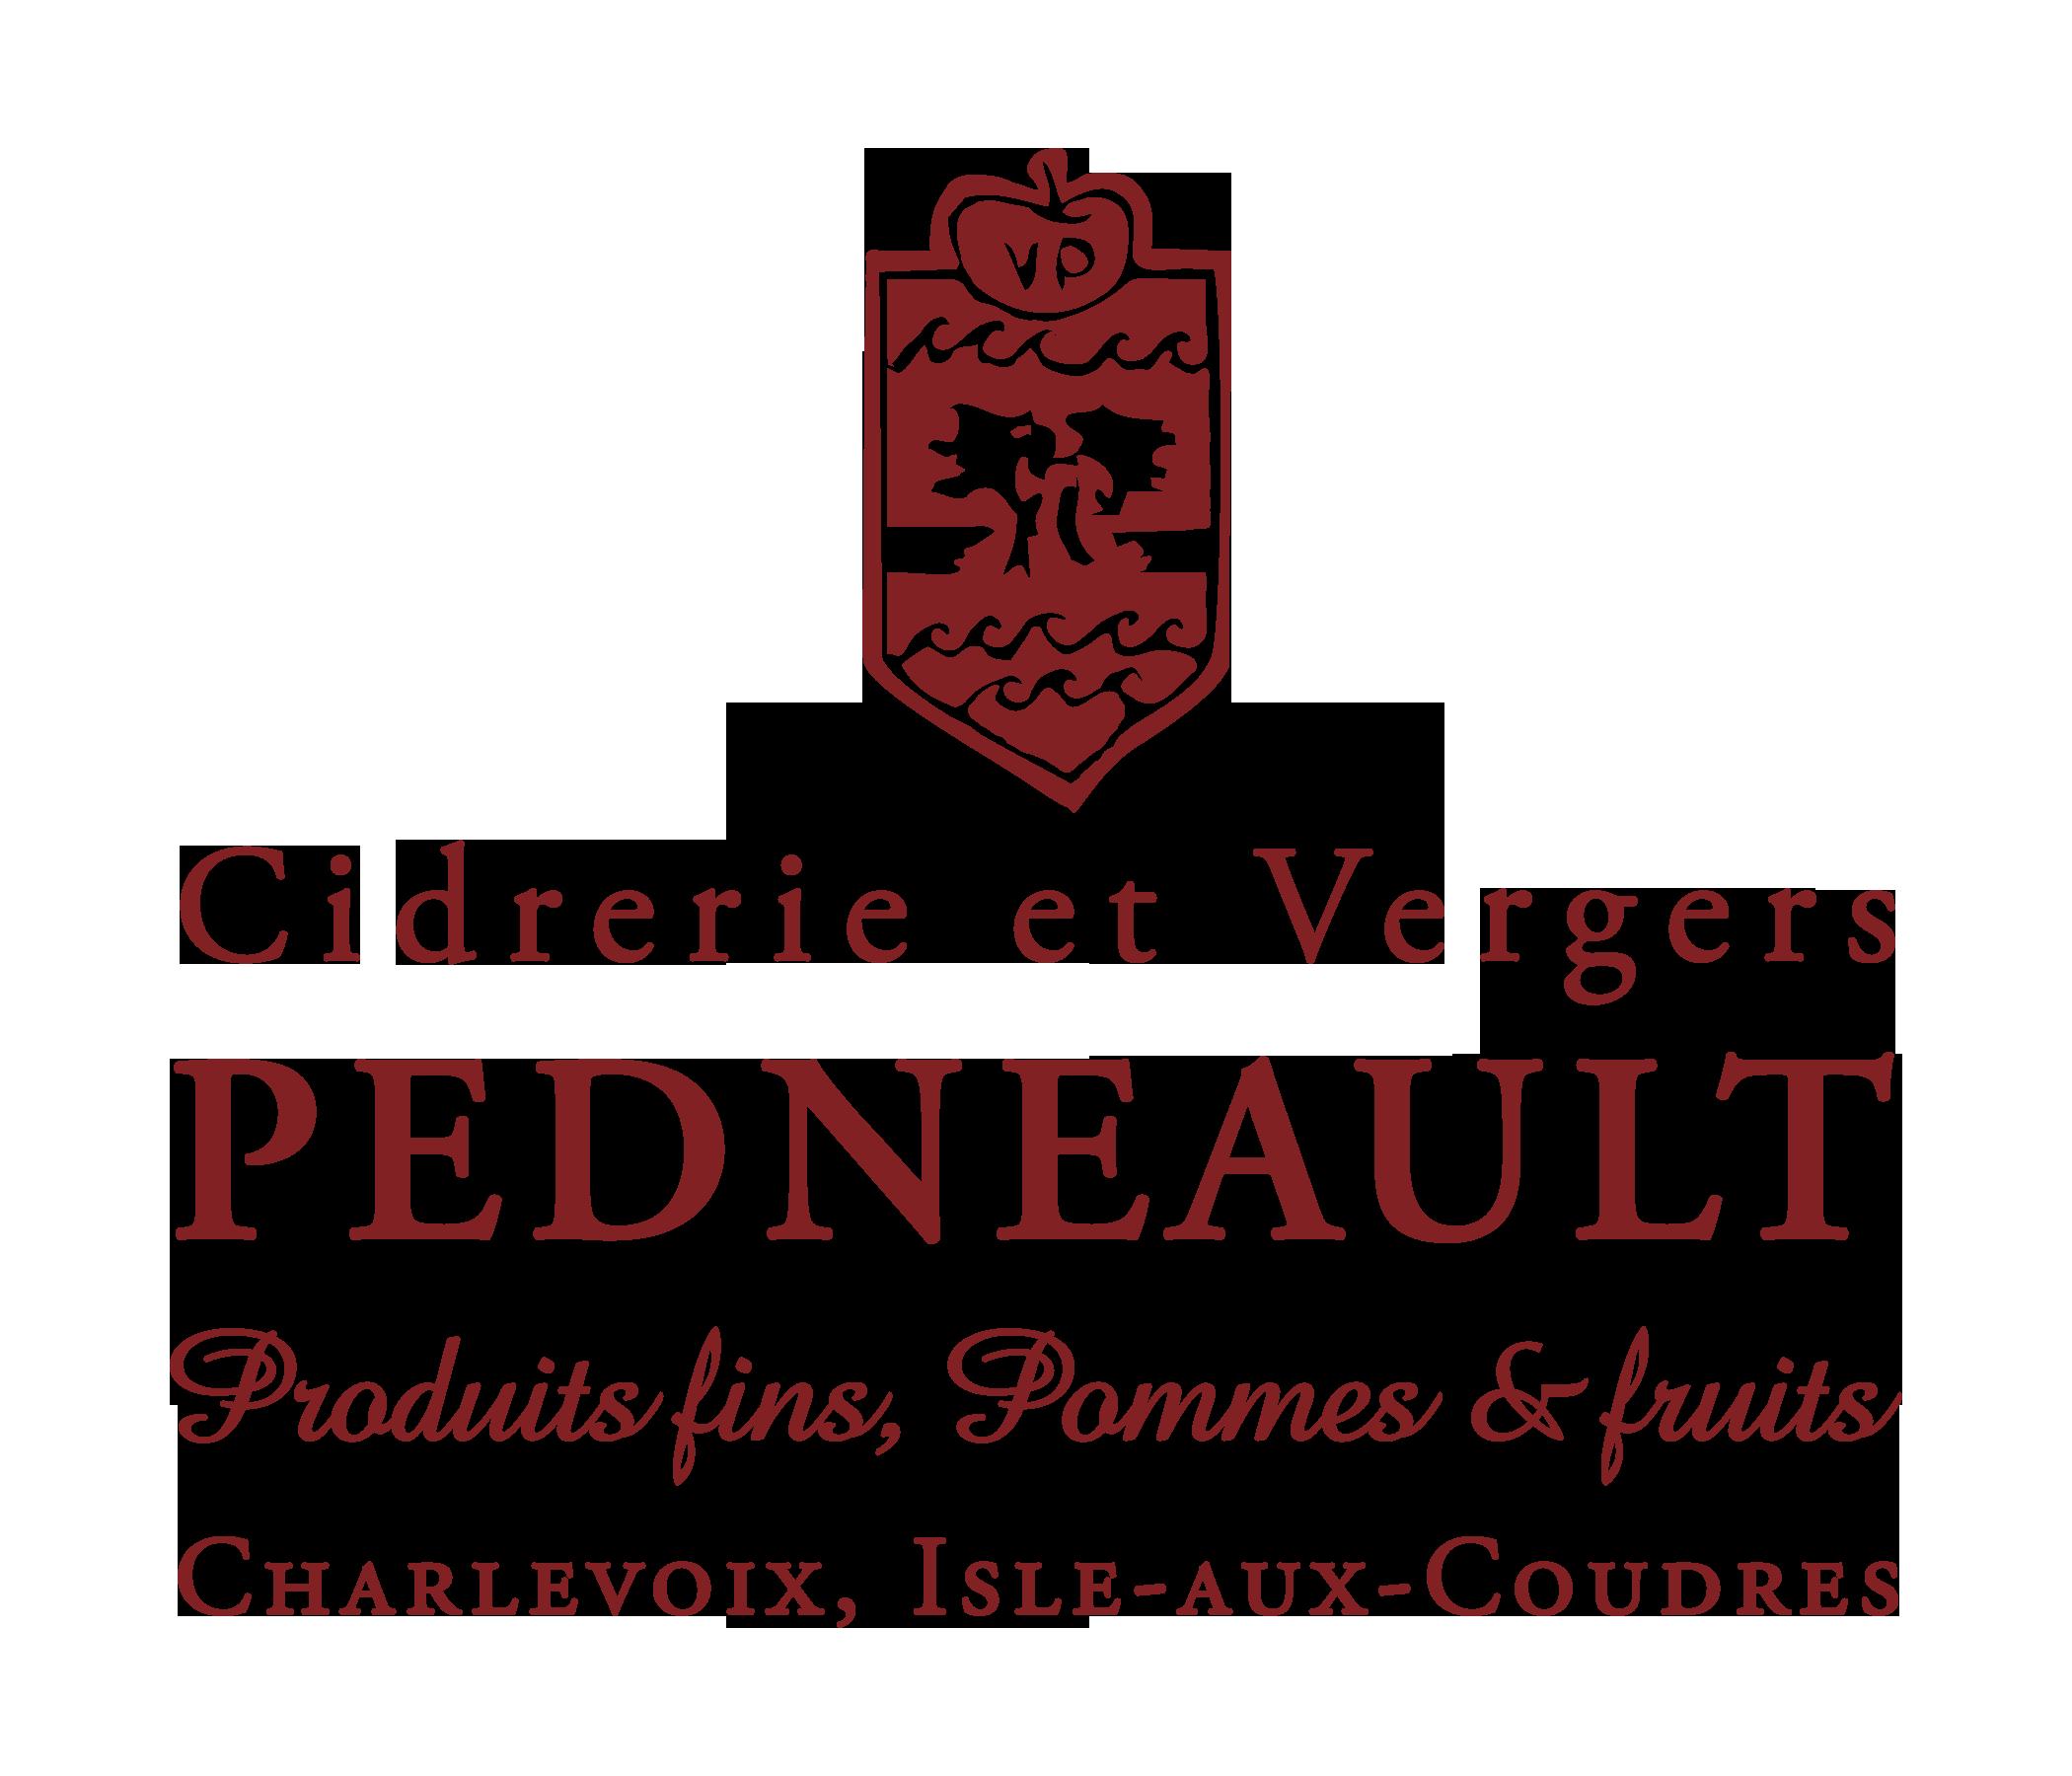 Cidrerie et Vergers Pedneault